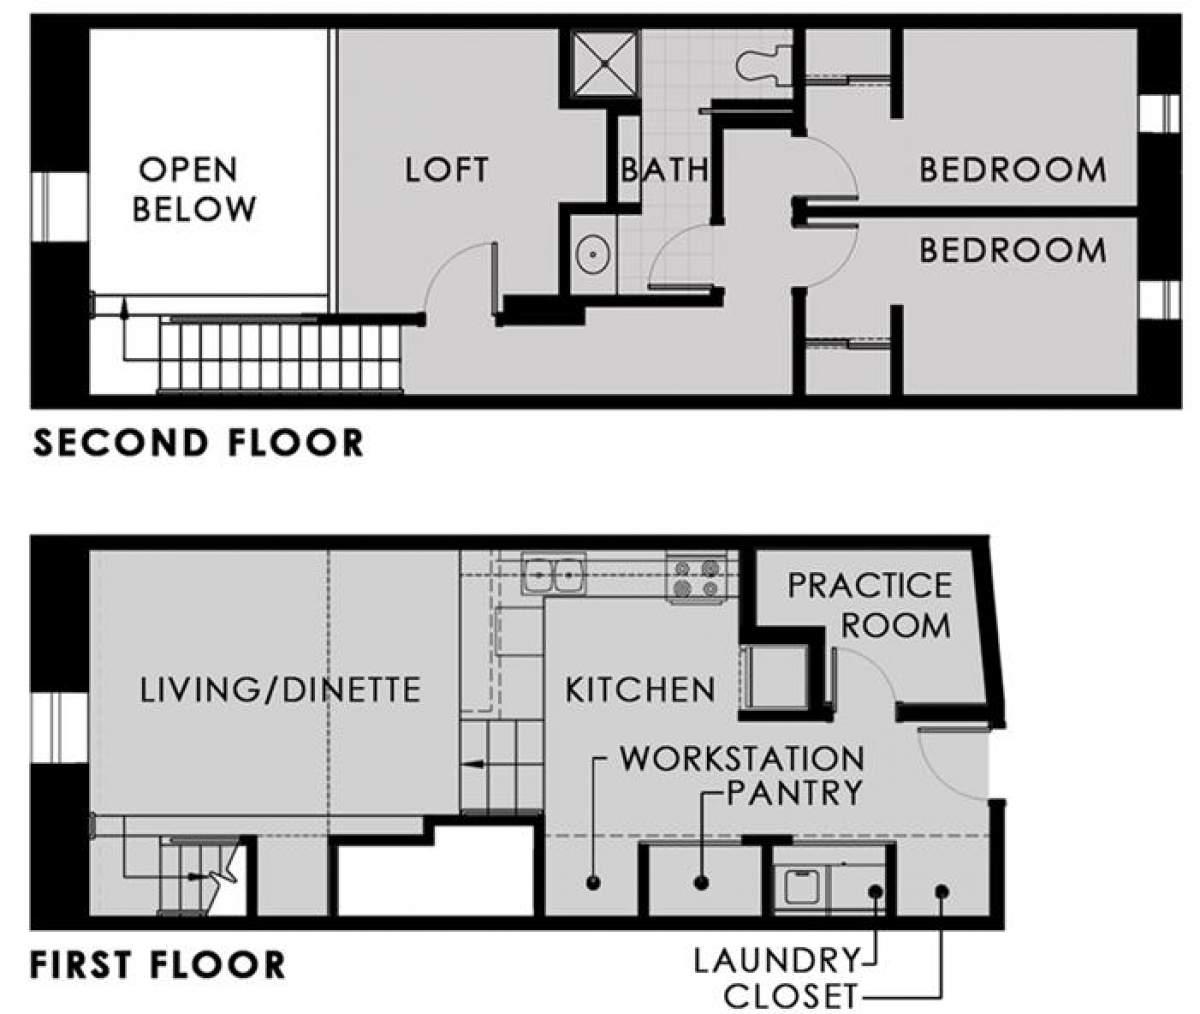 Church Lofts Of Fishtown Apartments Philadelphia Pa: Halo Lofts > Work > CJS Architects